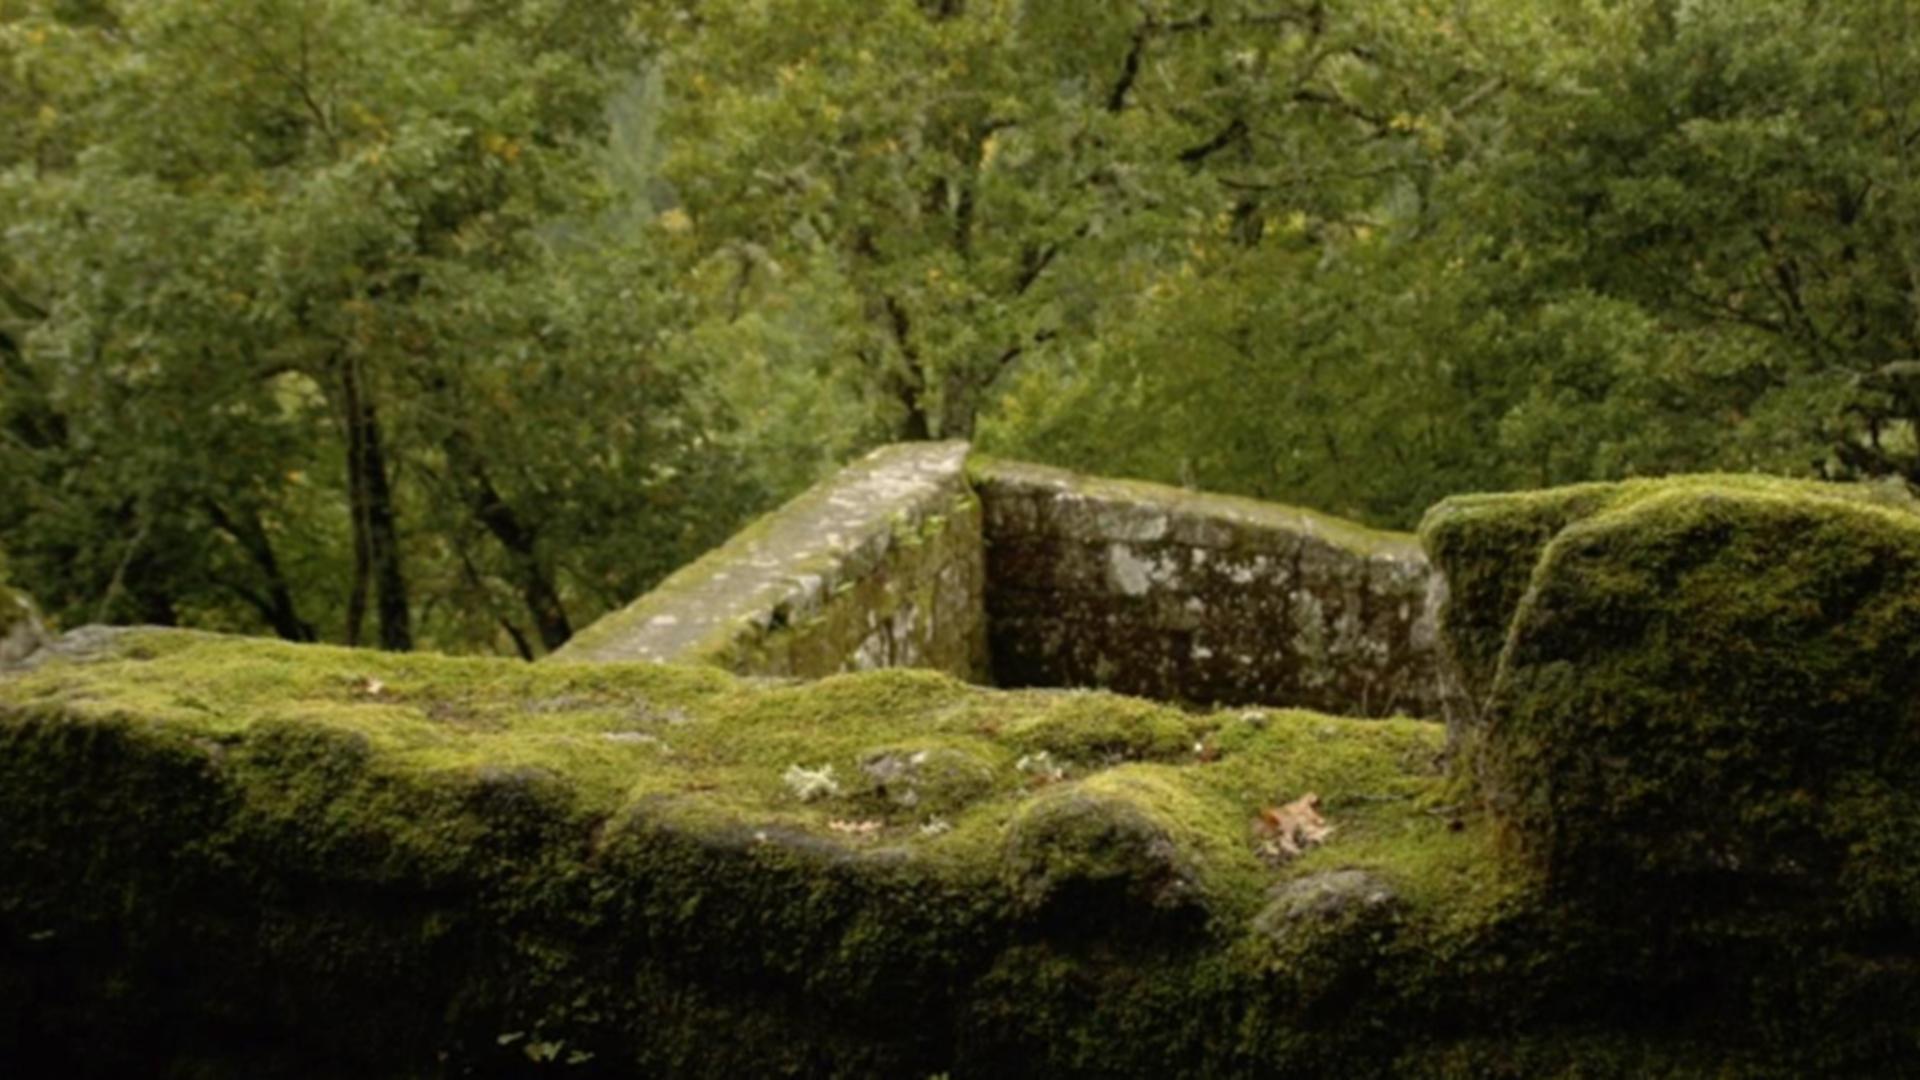 O reino suevo de Galicia